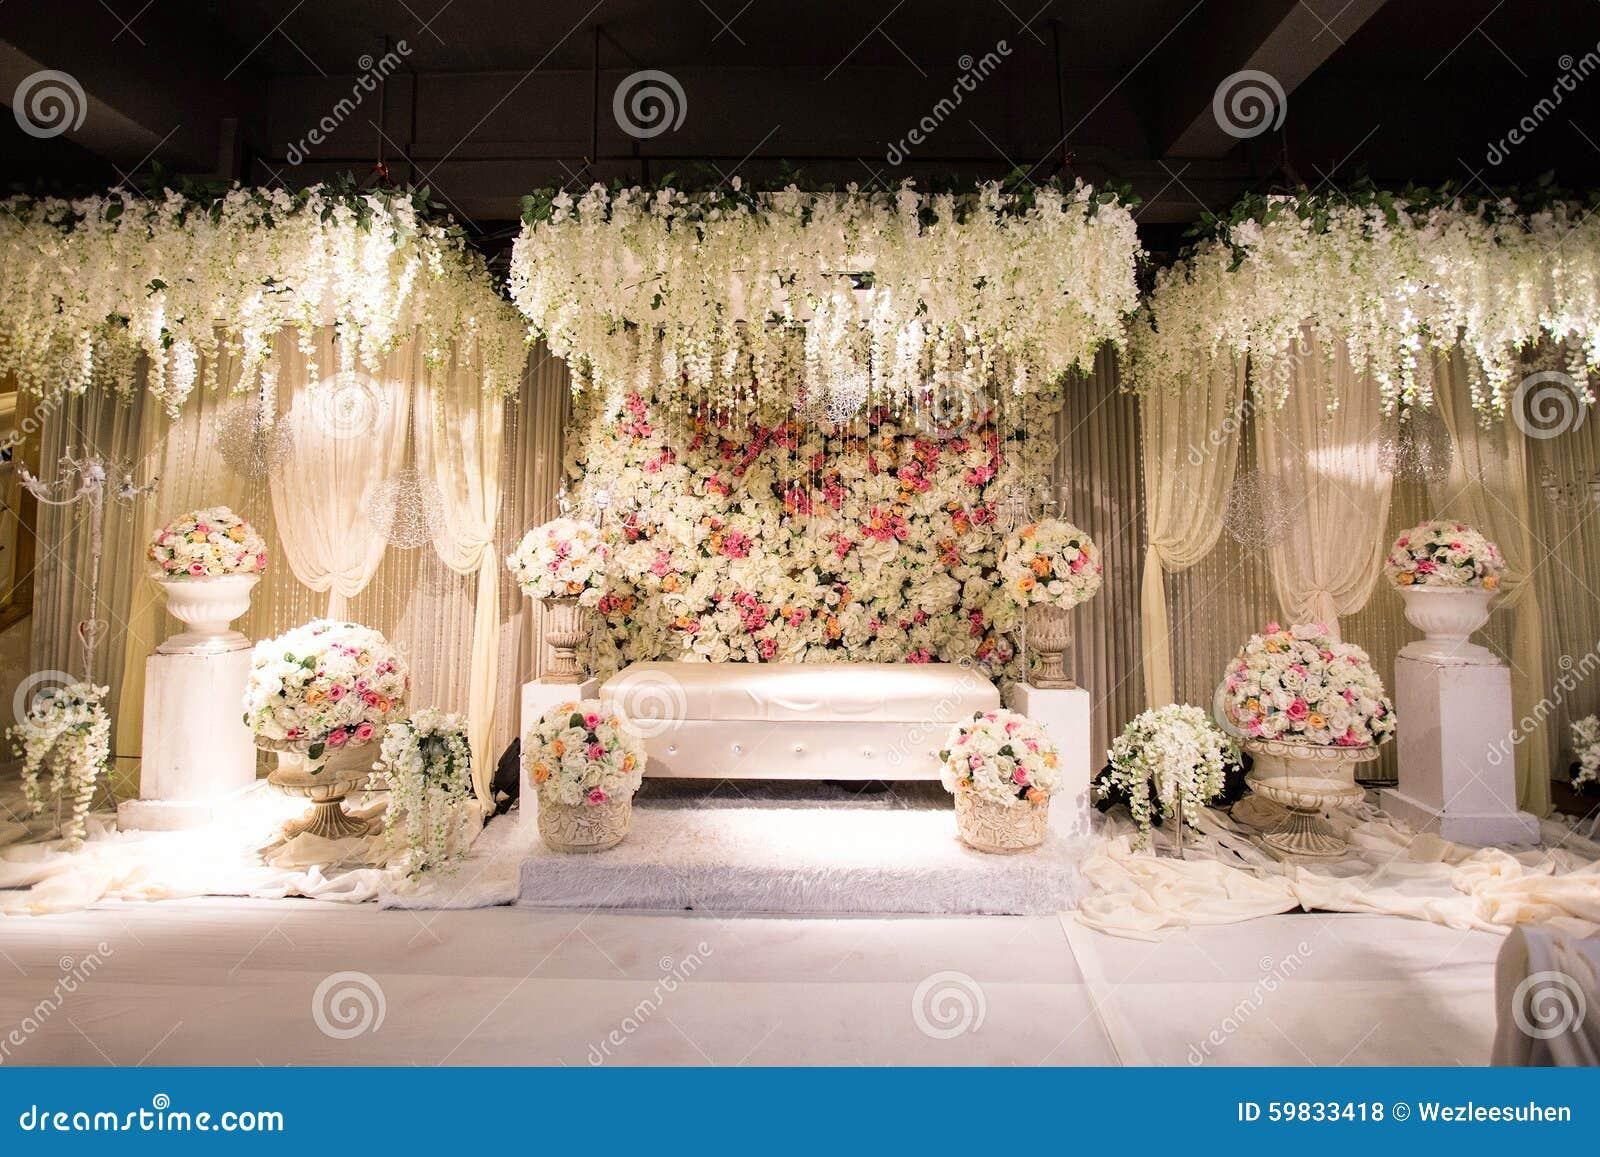 Beautiful decorated english theme wedding altar stock photo beautiful decorated english theme wedding altar junglespirit Gallery